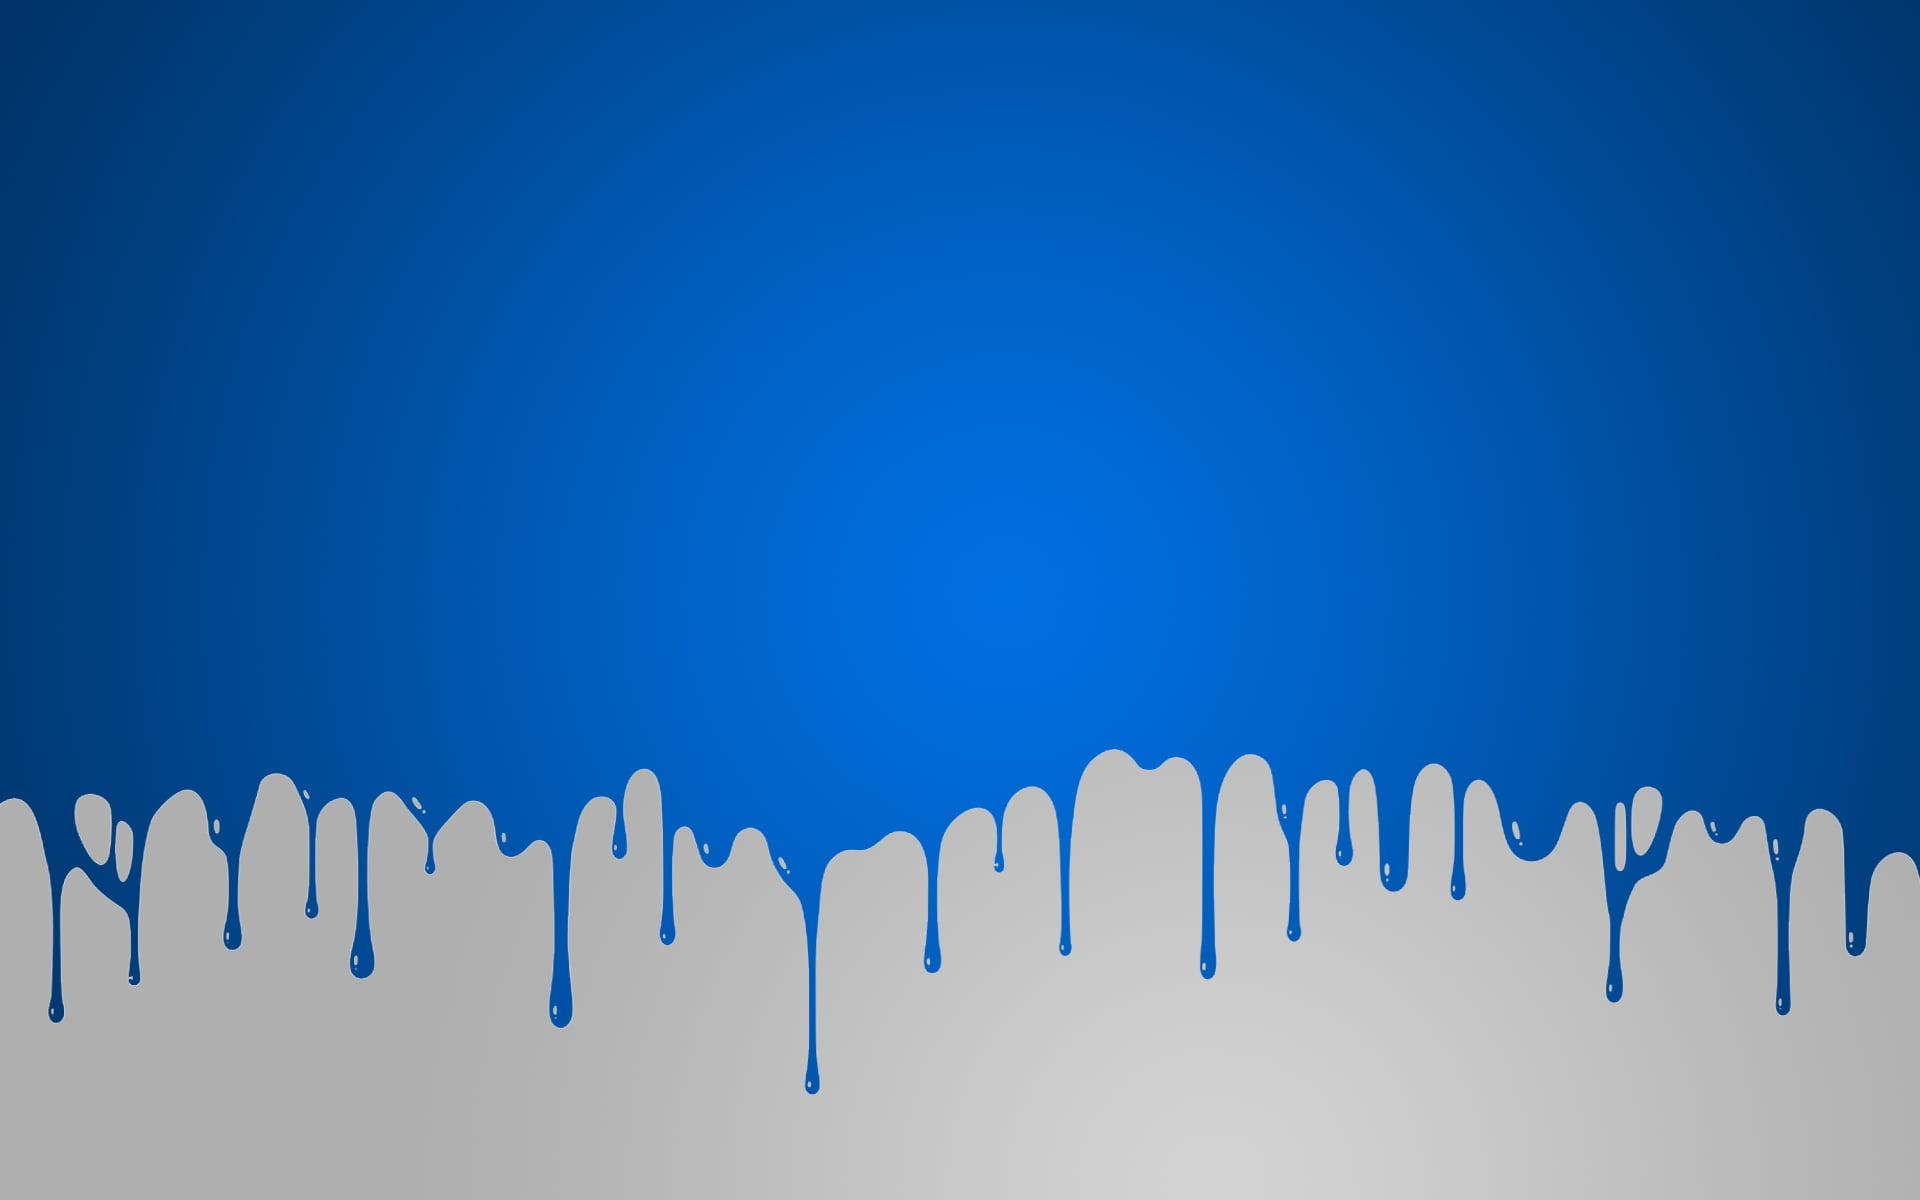 Blue Paint Drip Wallpaper Digital Art Solid Color HD .jpg desktop wallpaper free download